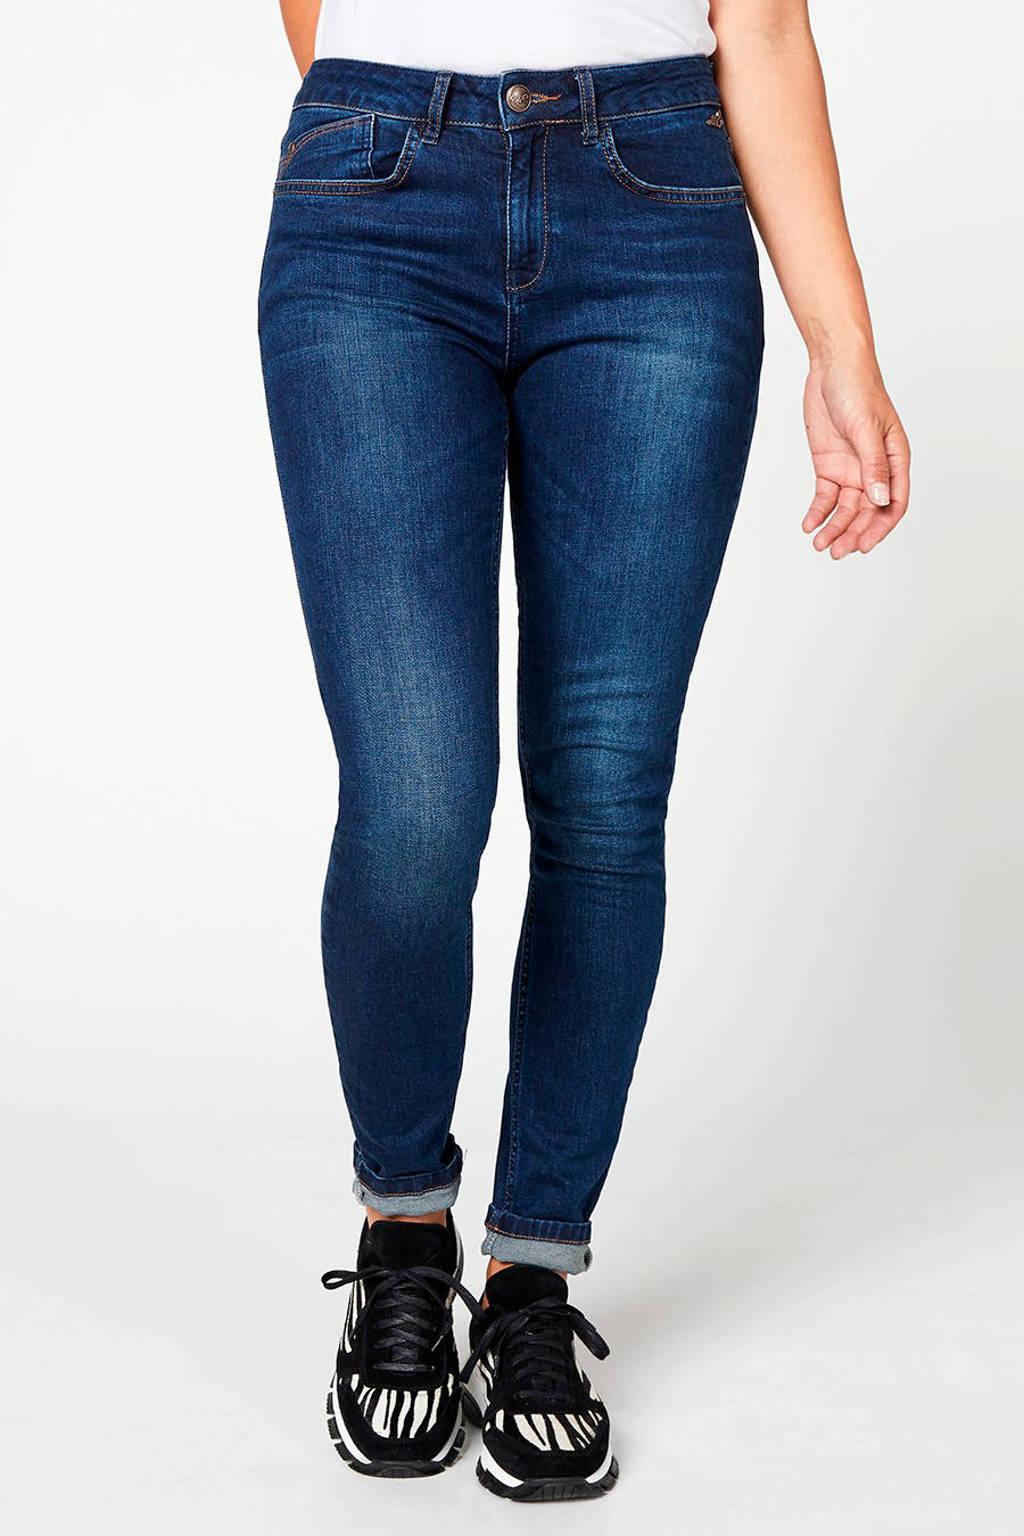 Miss Etam Regulier slim fit jeans blauw, Blauw